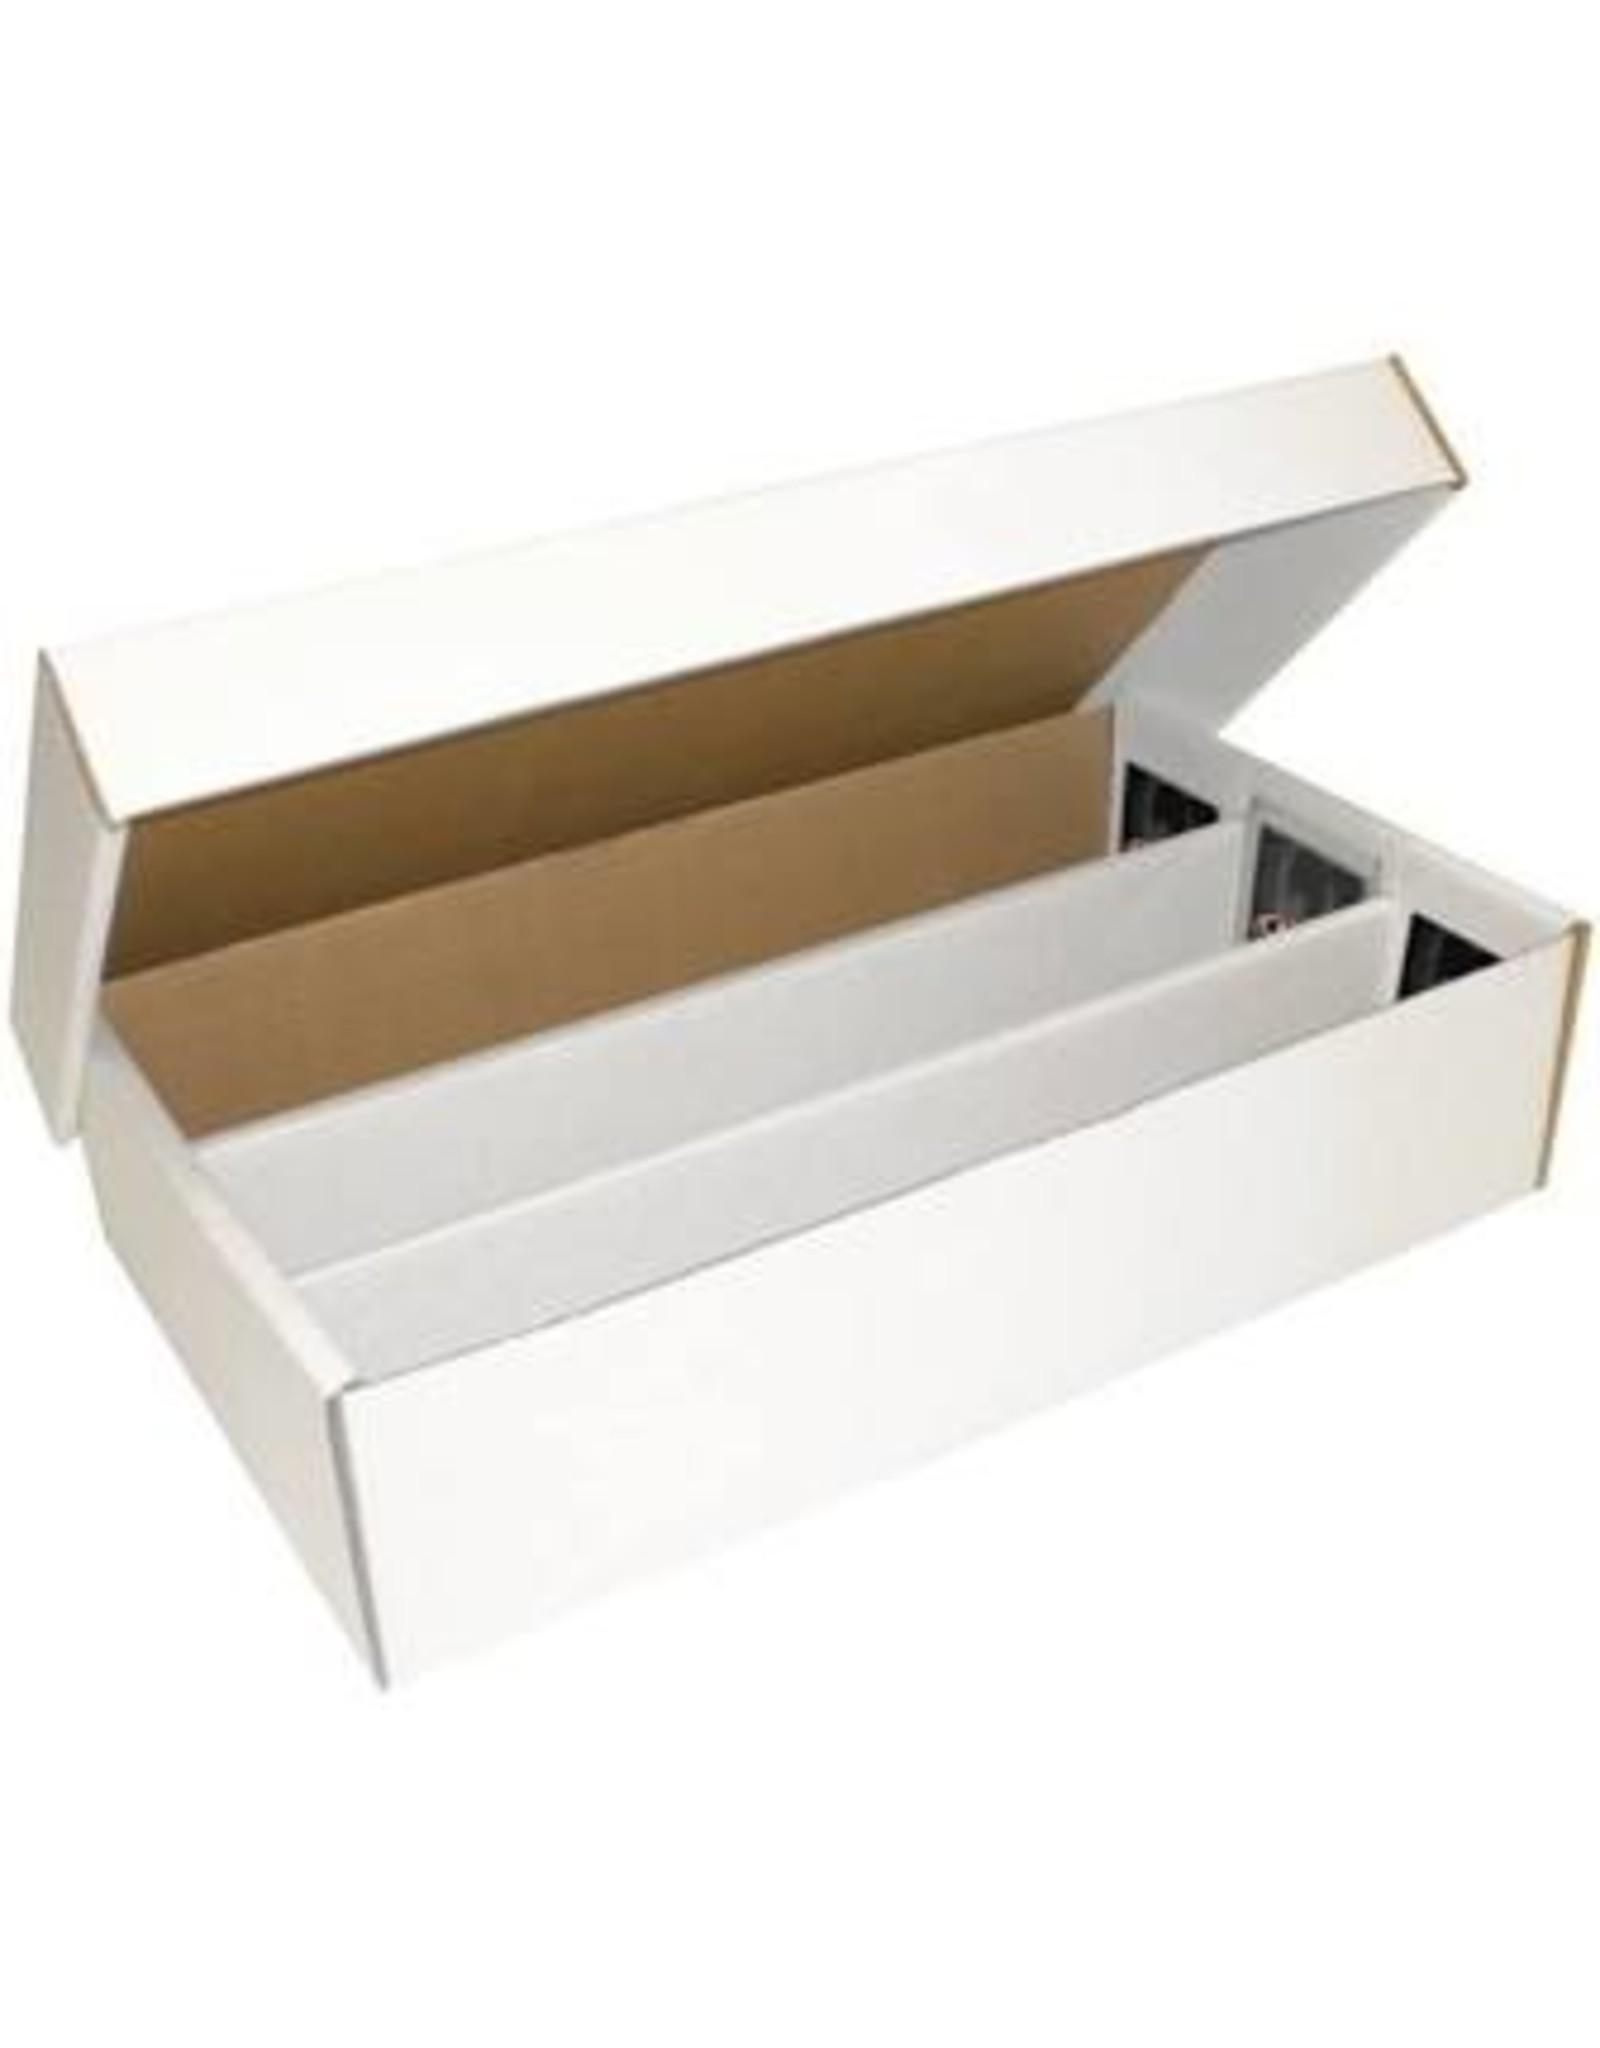 BCW Cardboard Box - 3000 Count